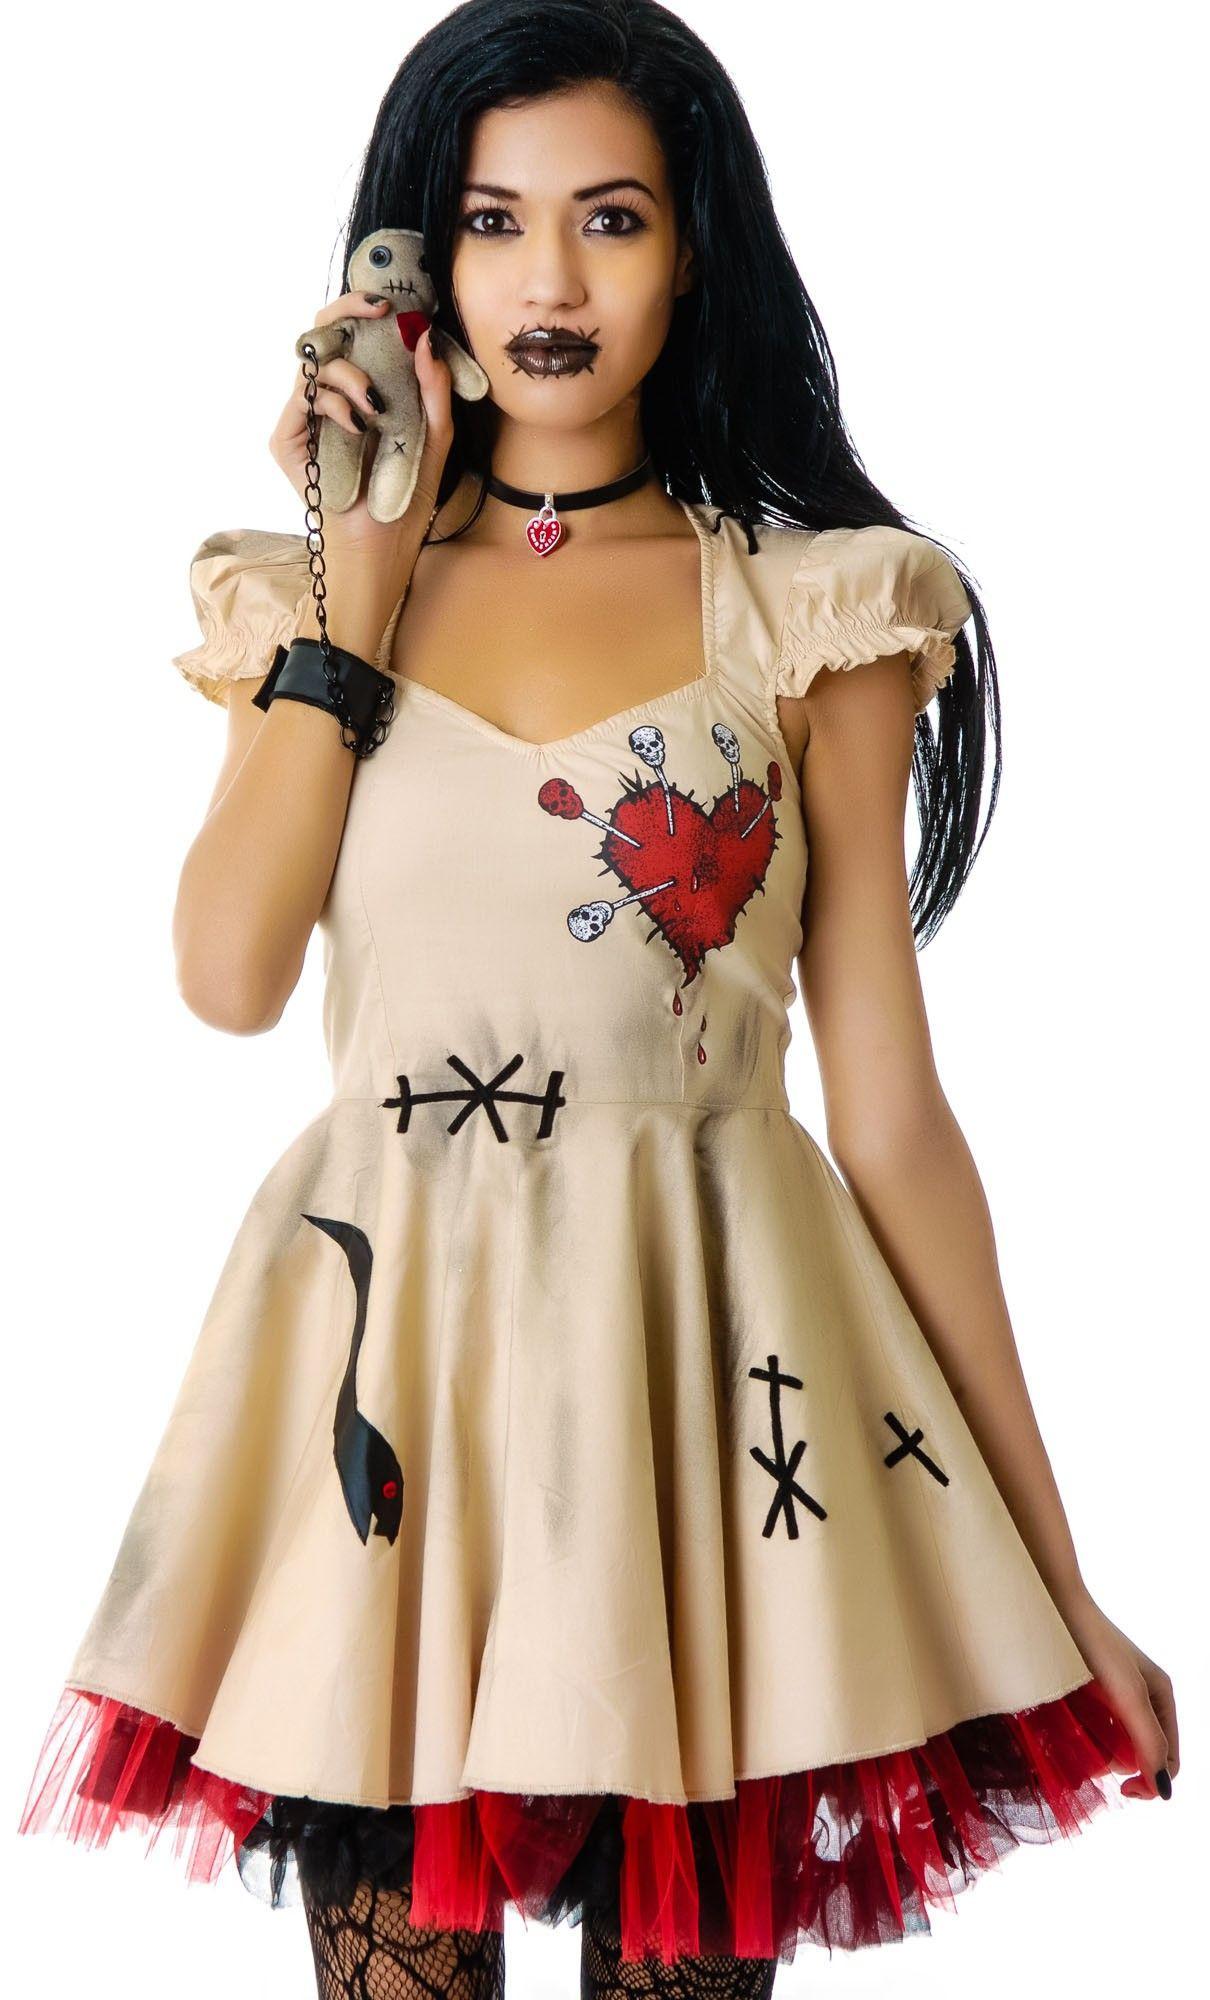 top 10 unique #halloween #costume ideas for #women in 2013